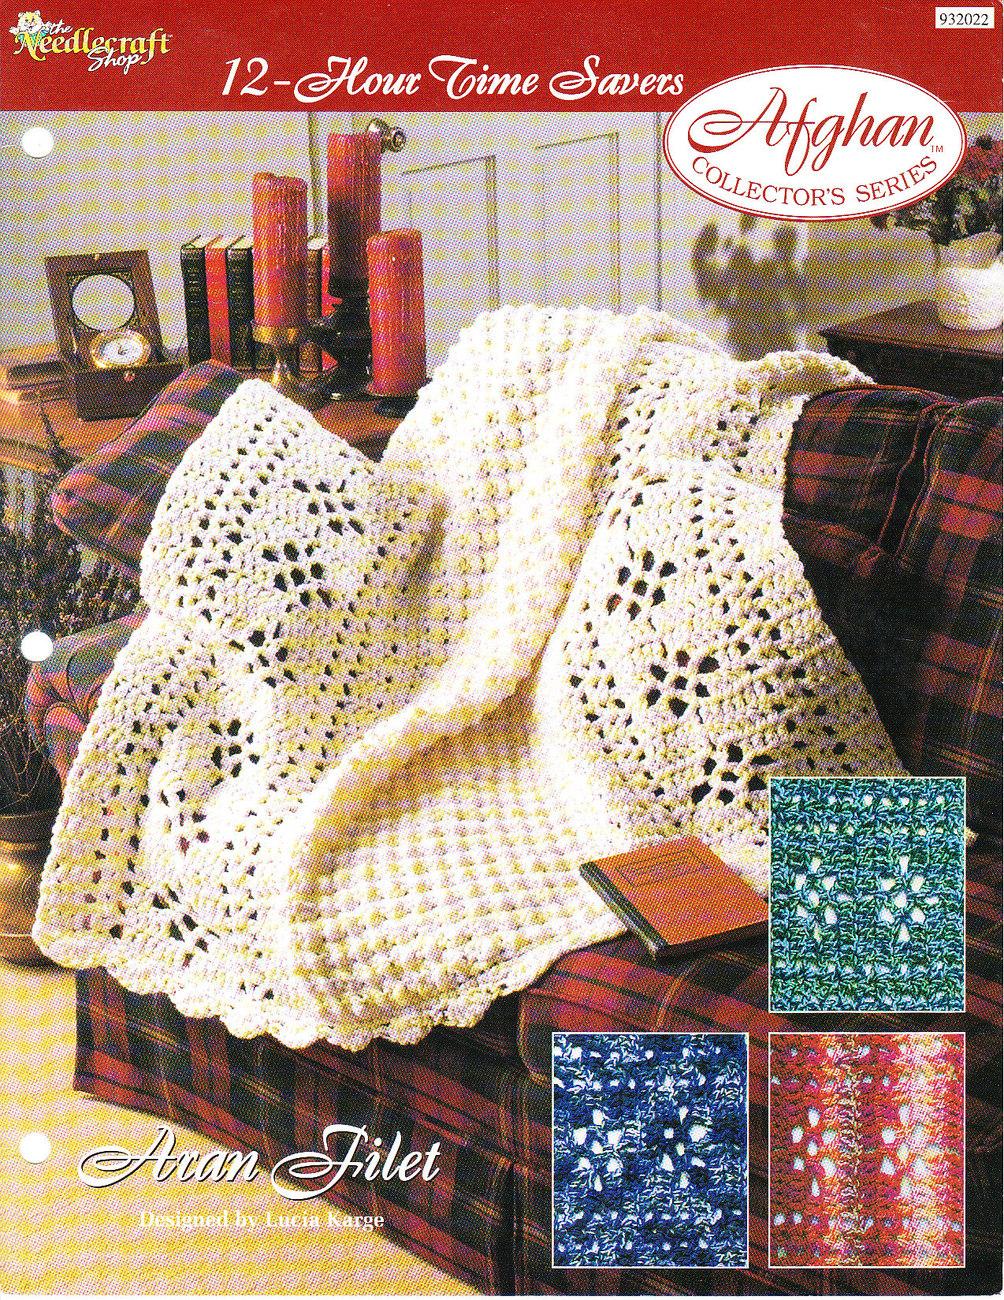 Angel Crib Knitting Pattern : *Crochet Afghan Collectors Series Pattern Aran Filet - Crocheting & ...